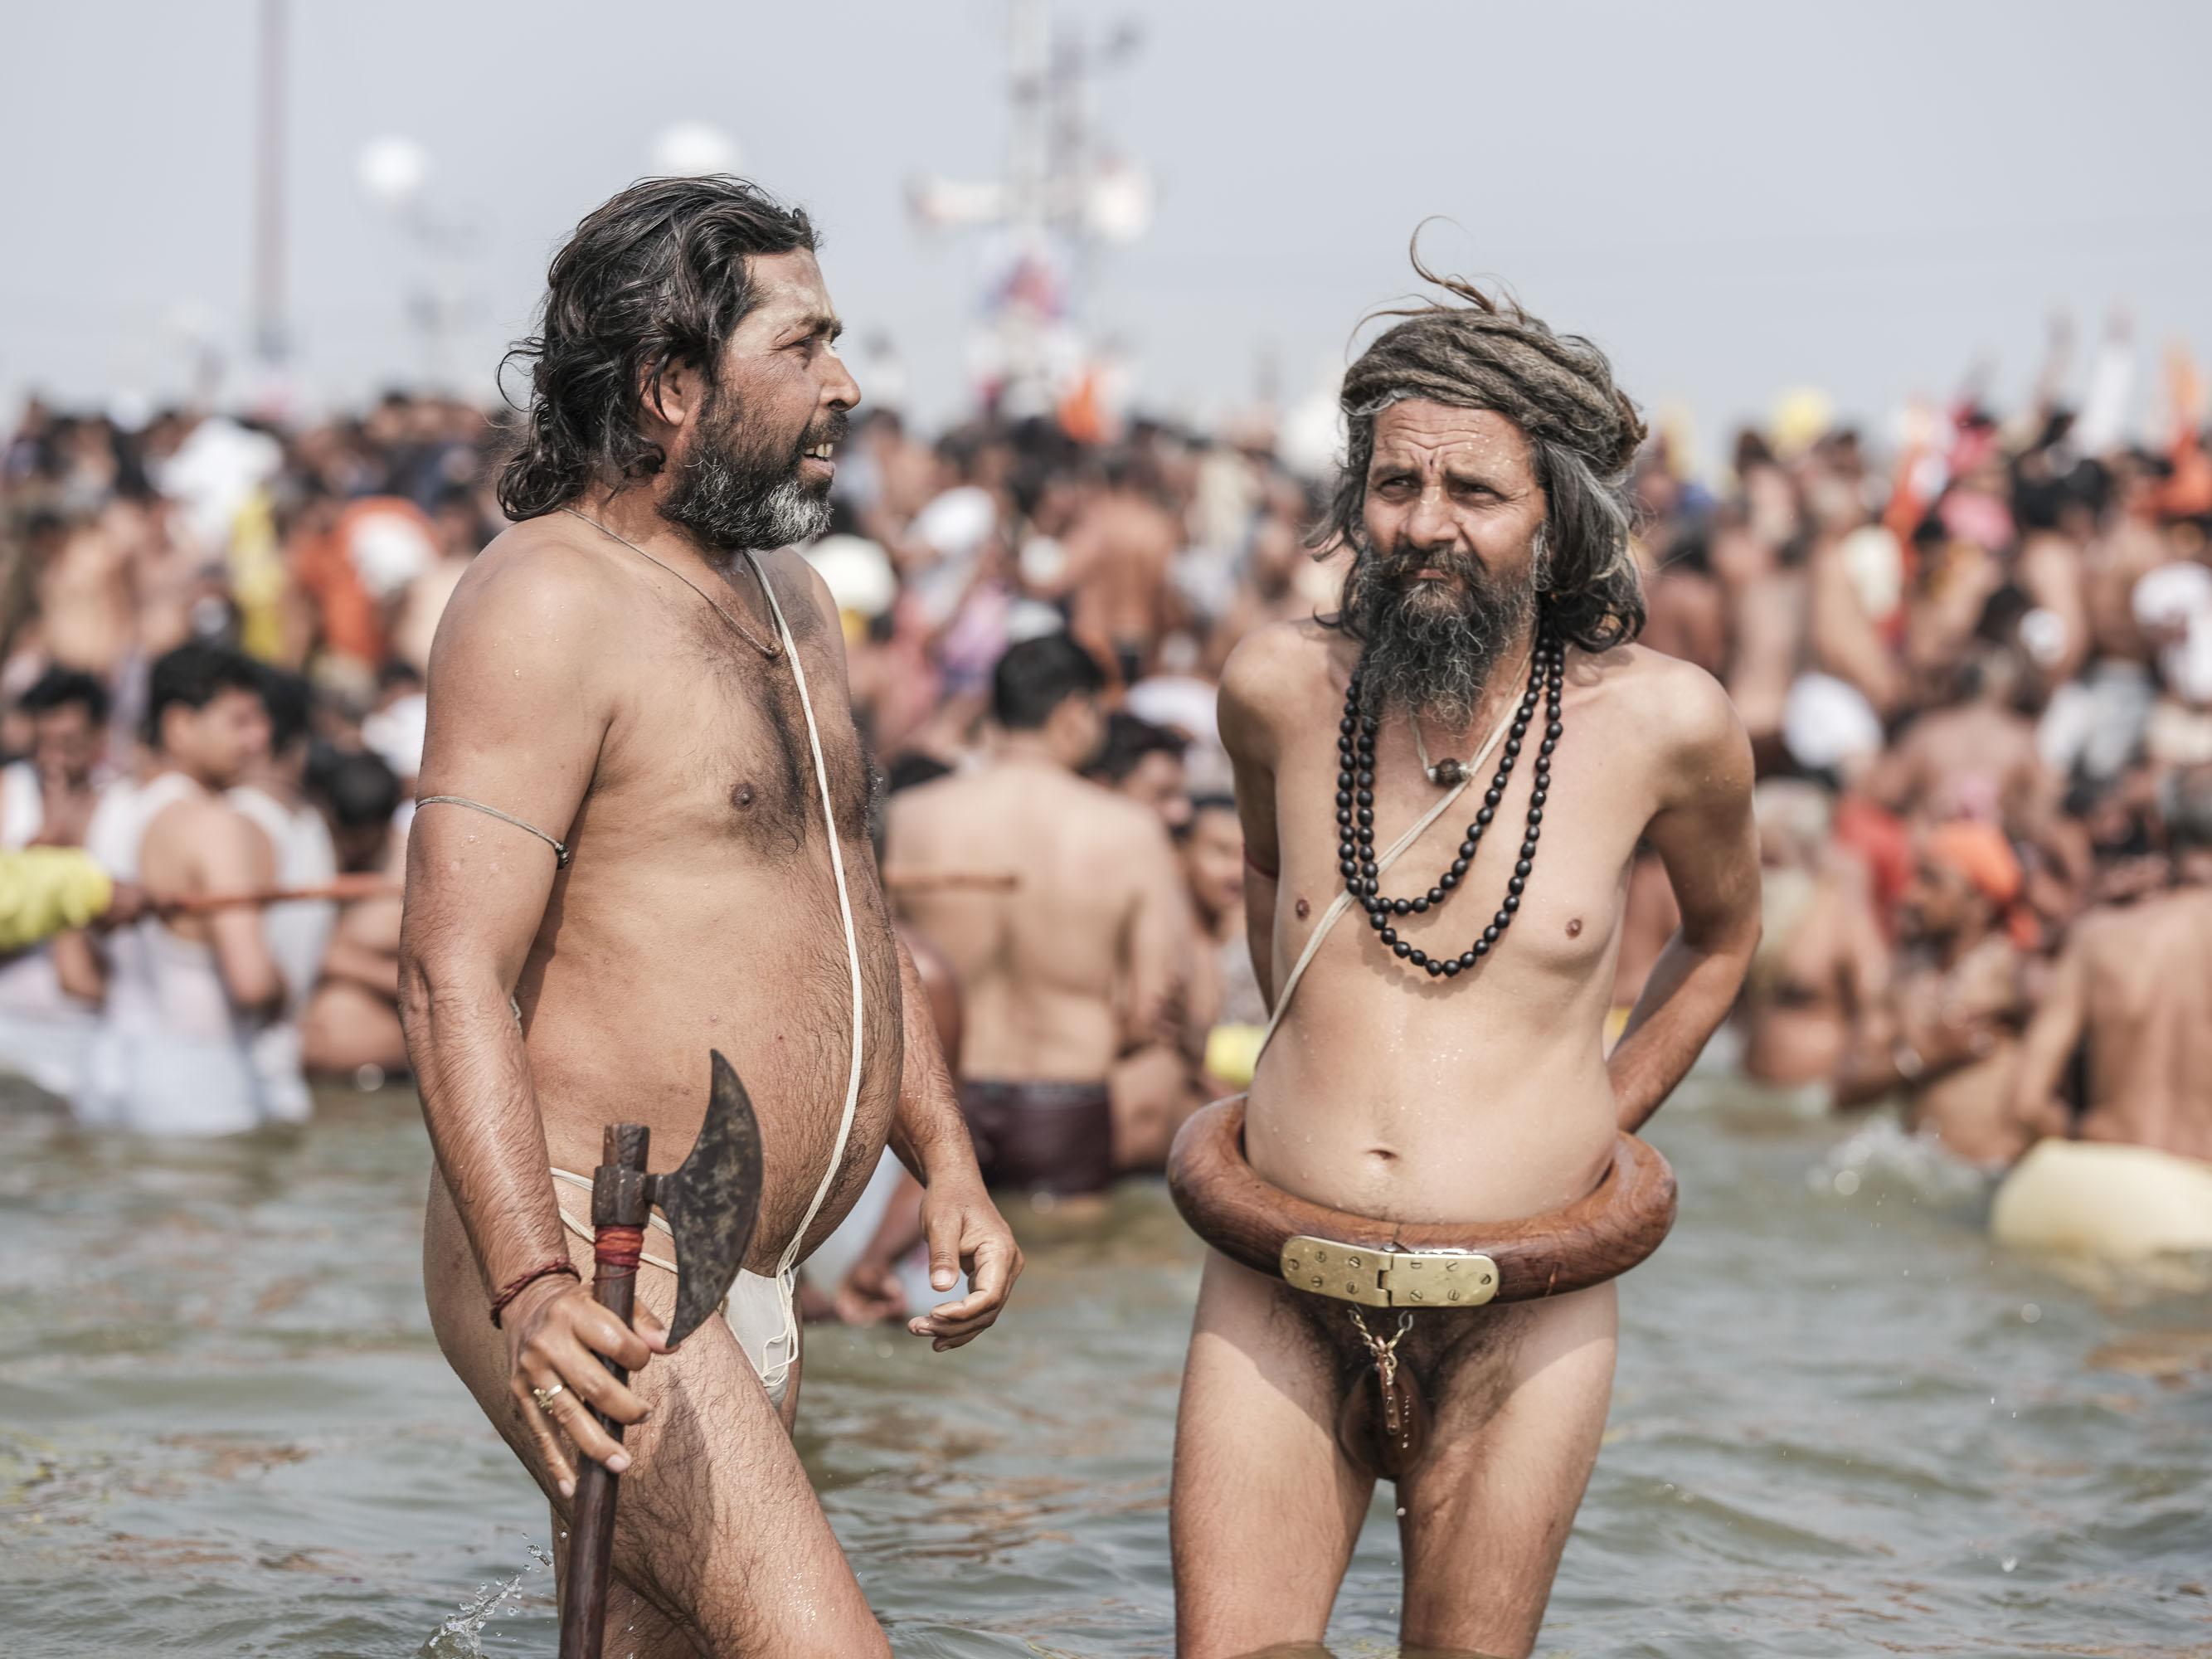 4 february baba men crowd bath axe pilgrims Kumbh mela 2019 India Allahabad Prayagraj Ardh hindu religious Festival event rivers photographer jose jeuland photography